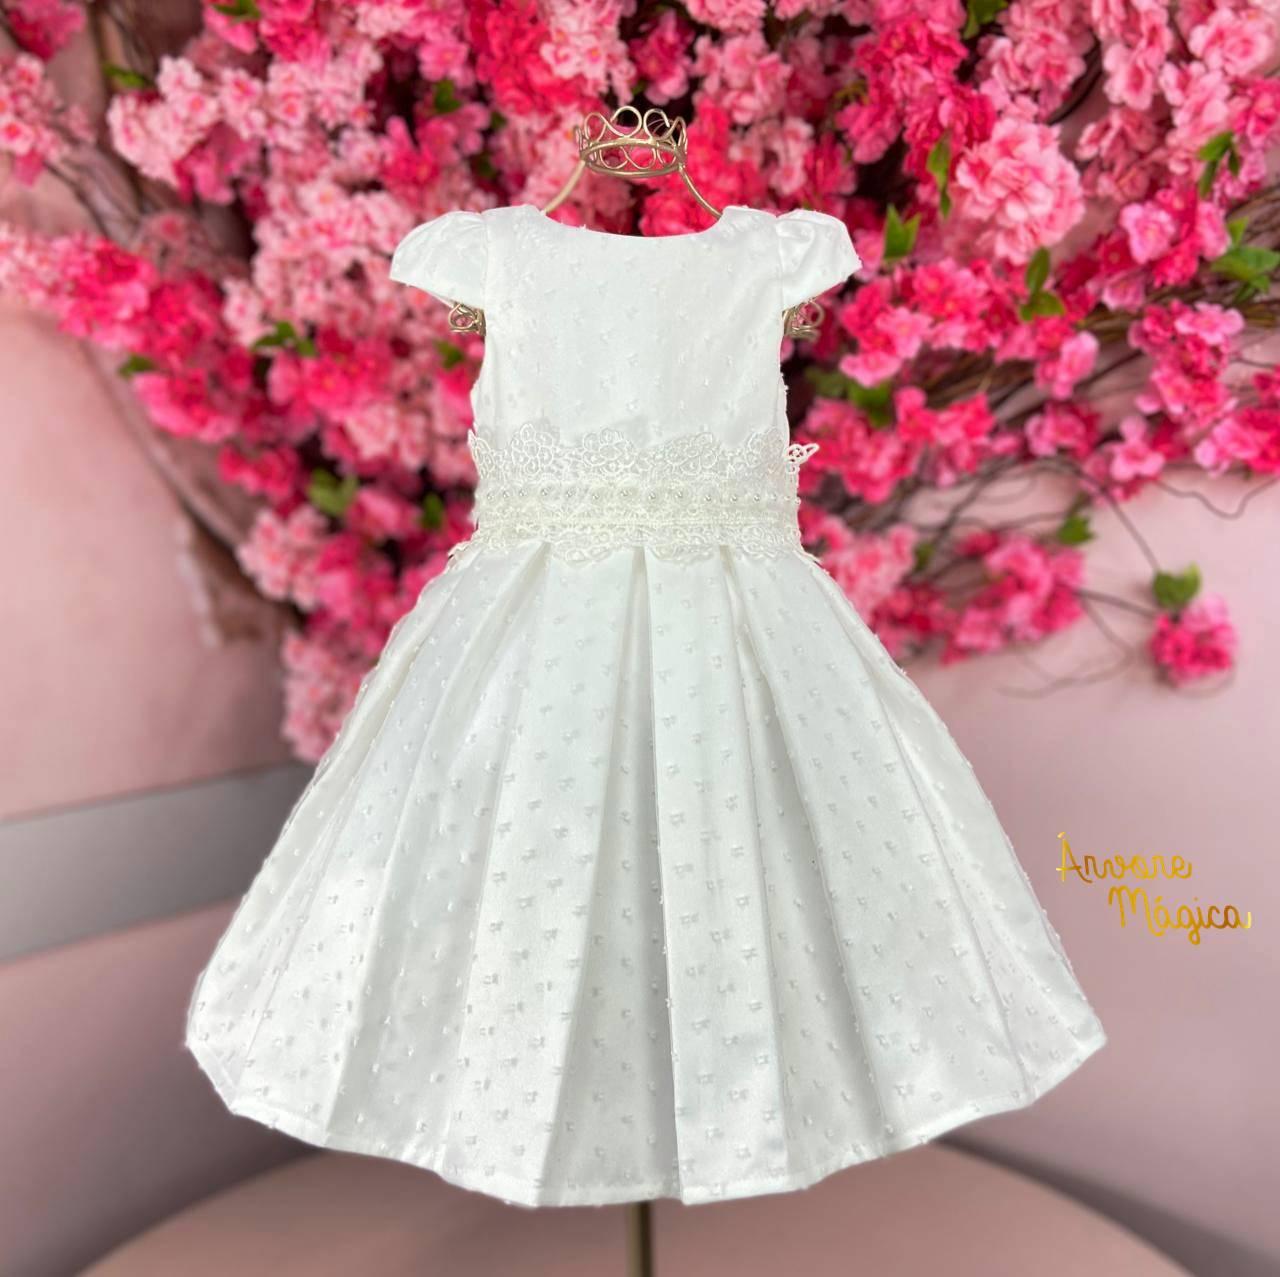 Vestido de Festa Infantil Branco Renda e Bordado Petit Cherie